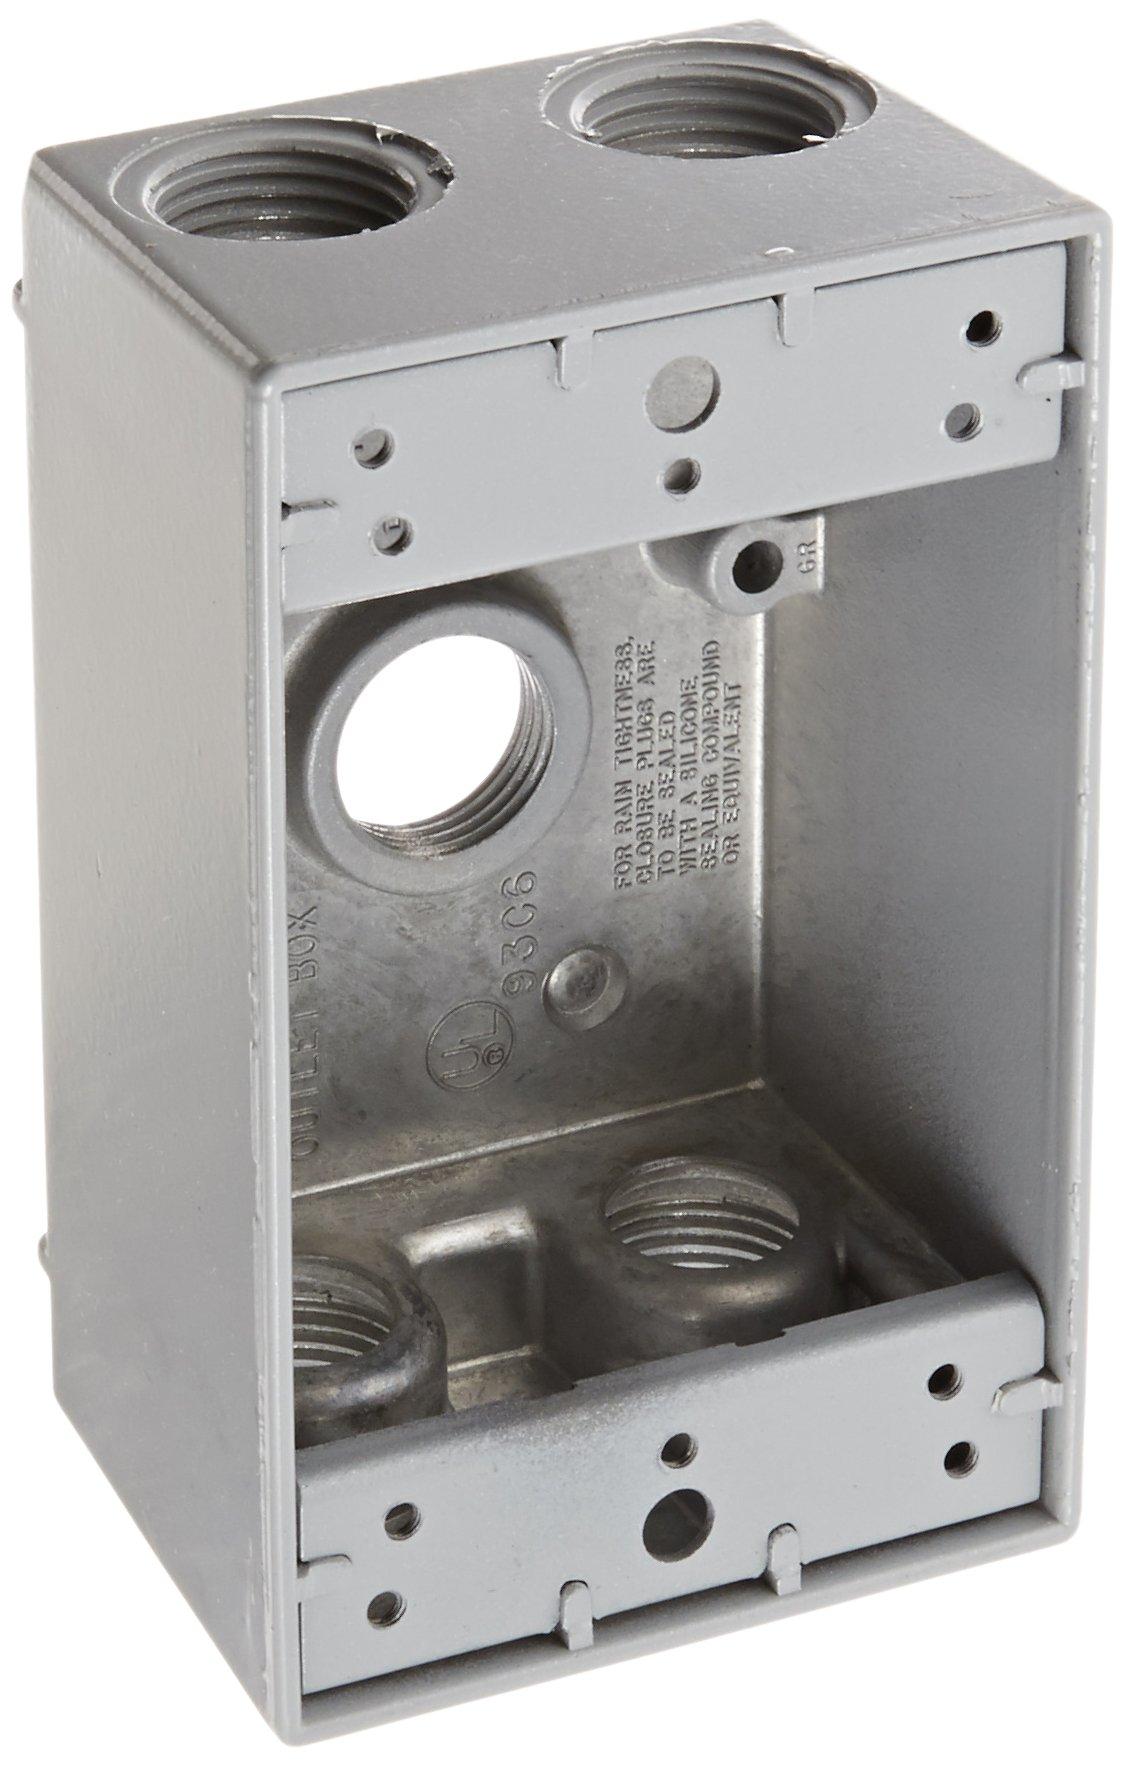 RAB Lighting B5 Weatherproof Single Gang Rectangular Box with 5 Holes, Aluminum, 1/2'' Tap Size, 2-3/4'' Length x 2'' Width x 4-3/4'' Height, Silver Gray